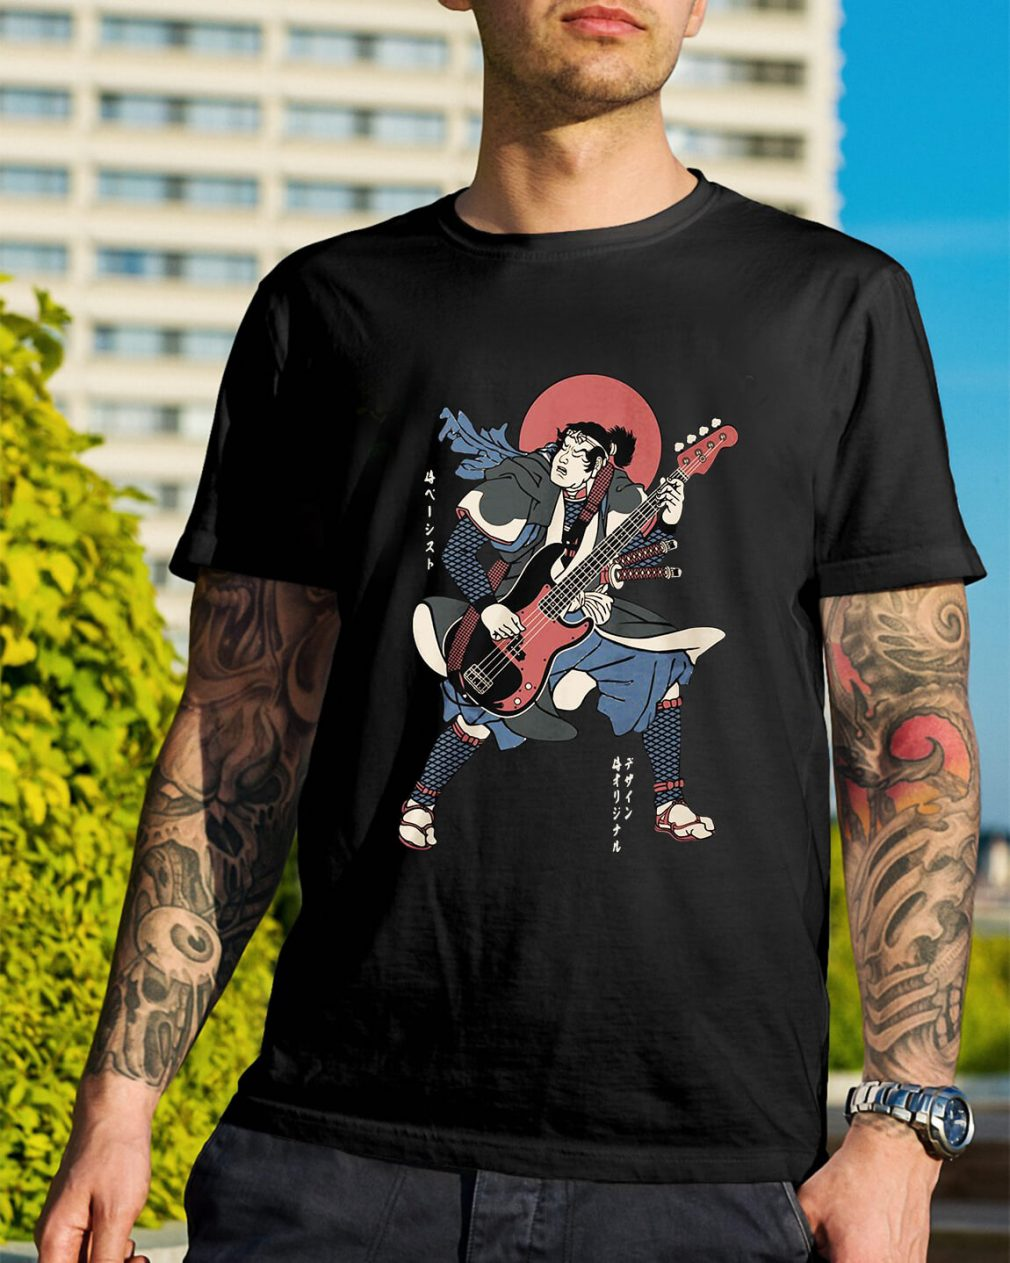 Official Samurai guitar shirt